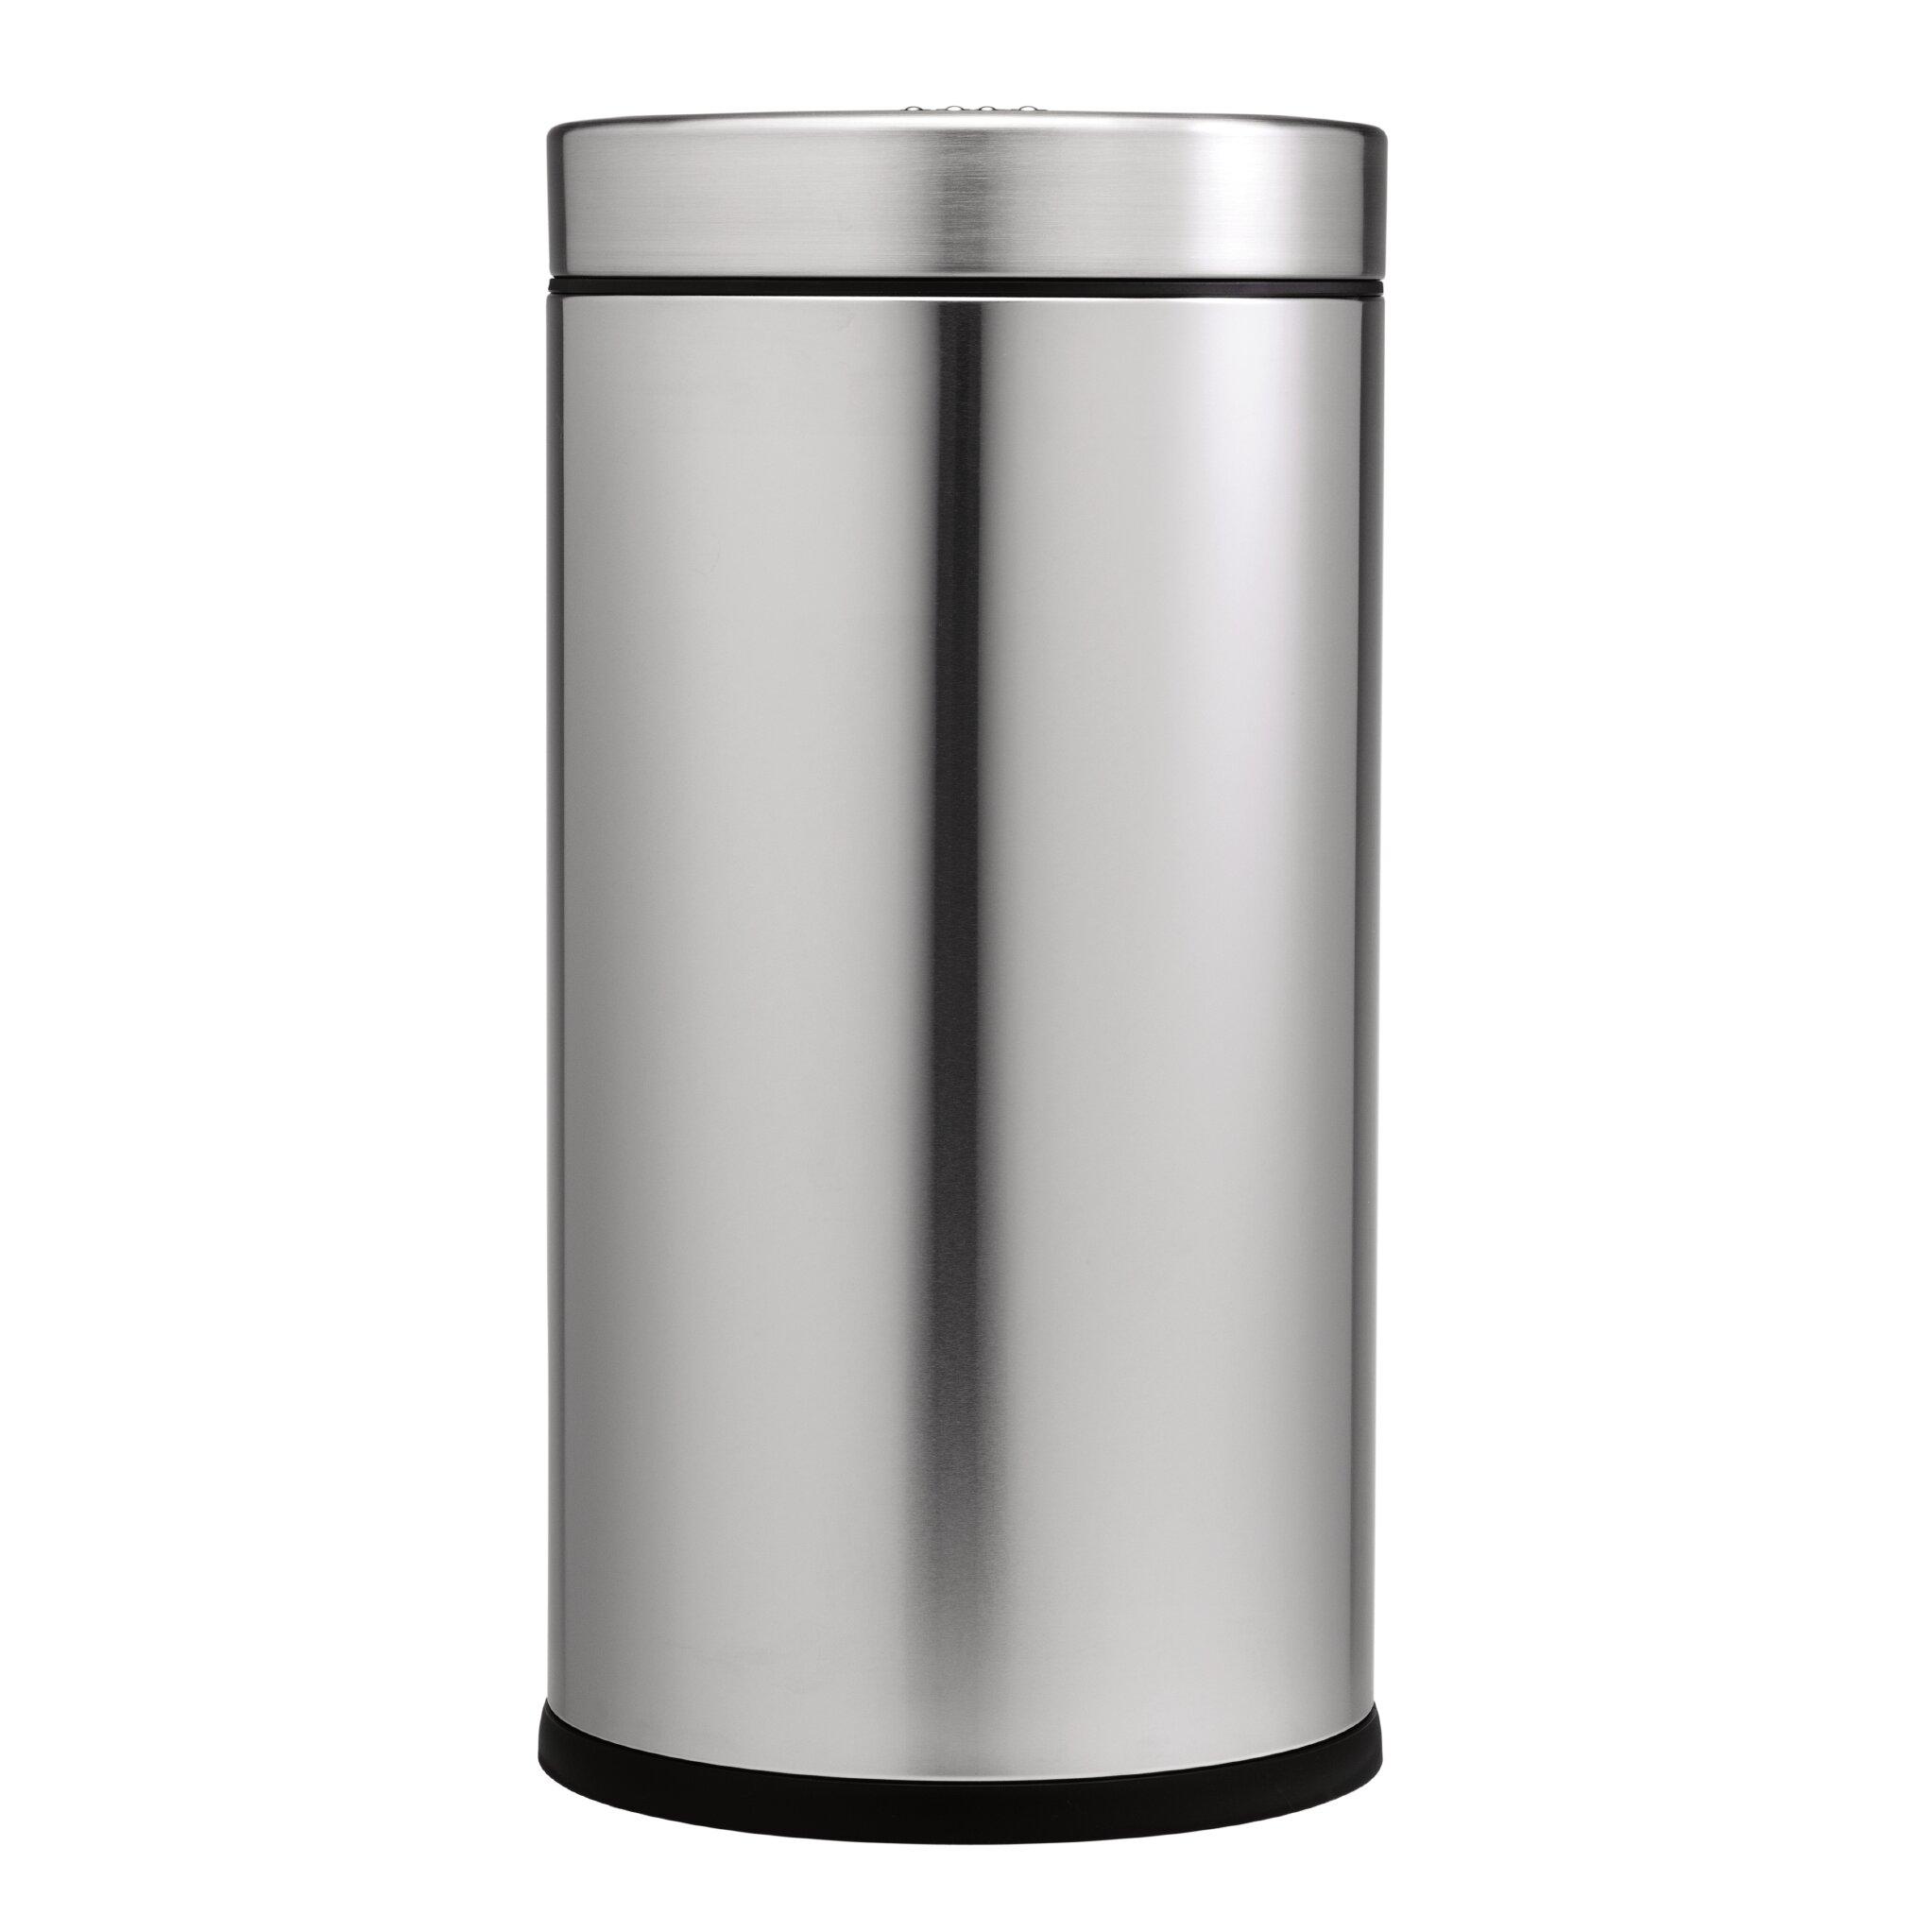 55 l 14 5 gal swing top trash can commercial grade stainless steel wayfair. Black Bedroom Furniture Sets. Home Design Ideas